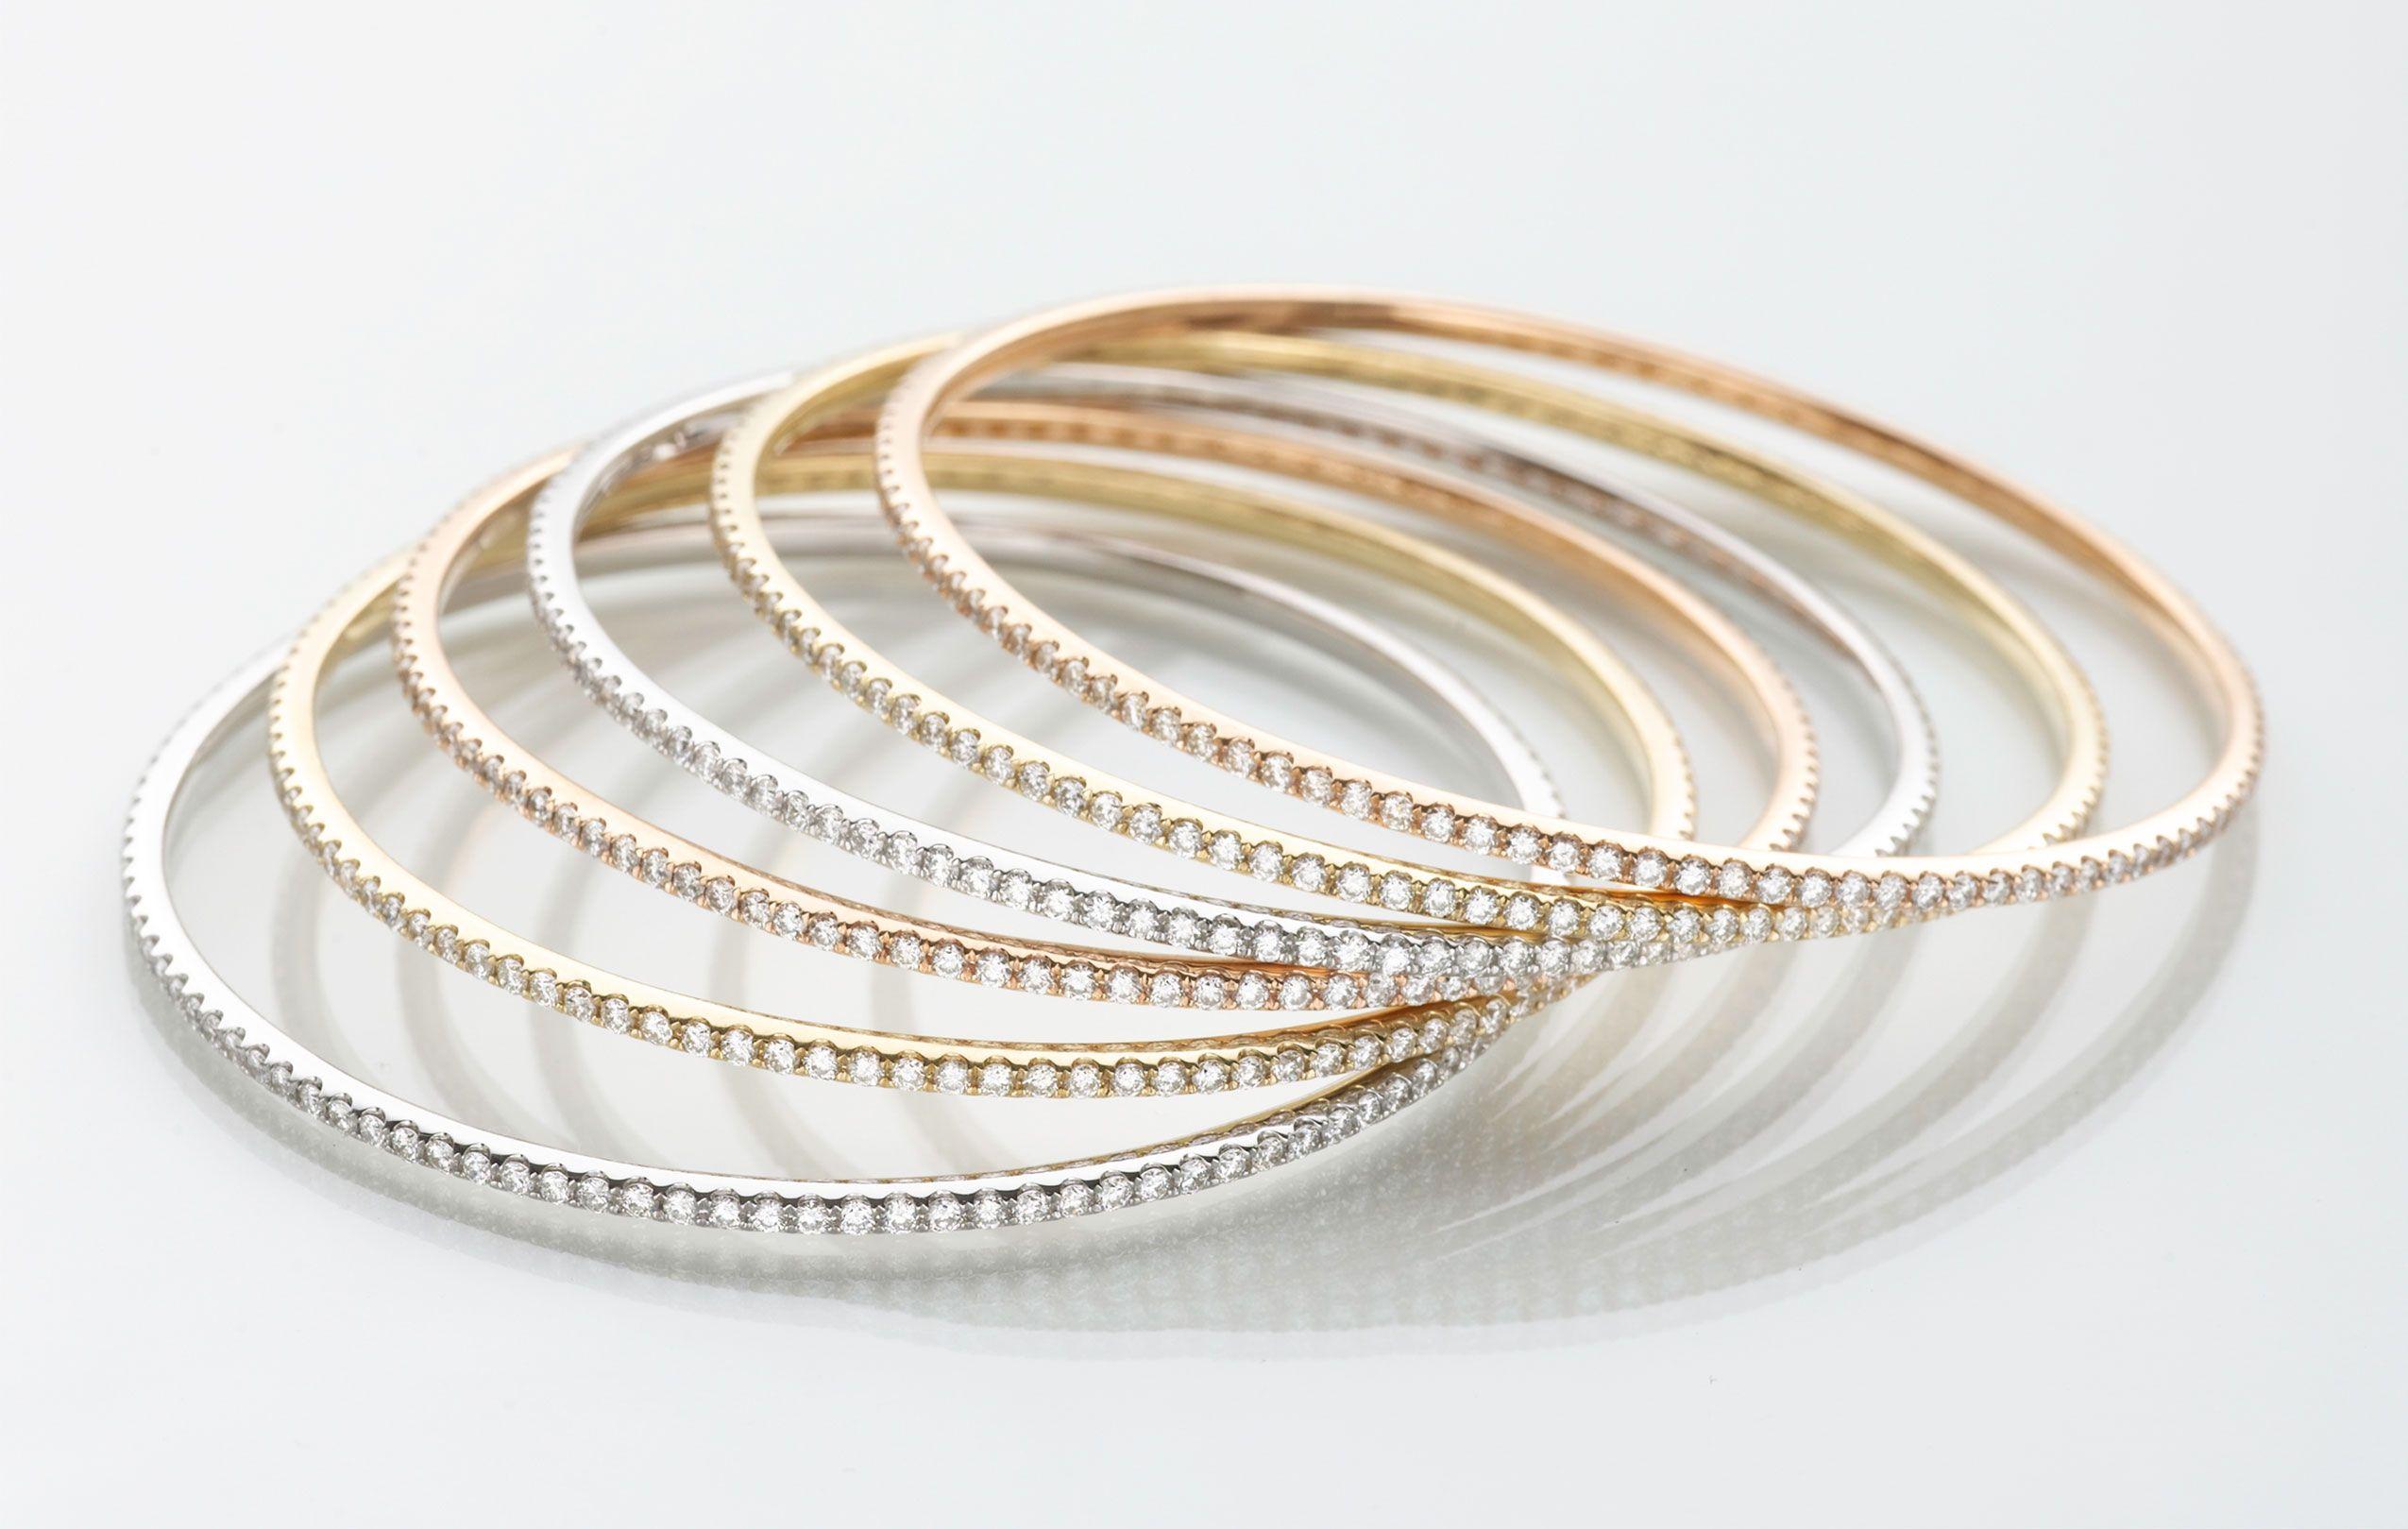 Jewelry-5-bracelets.jpg